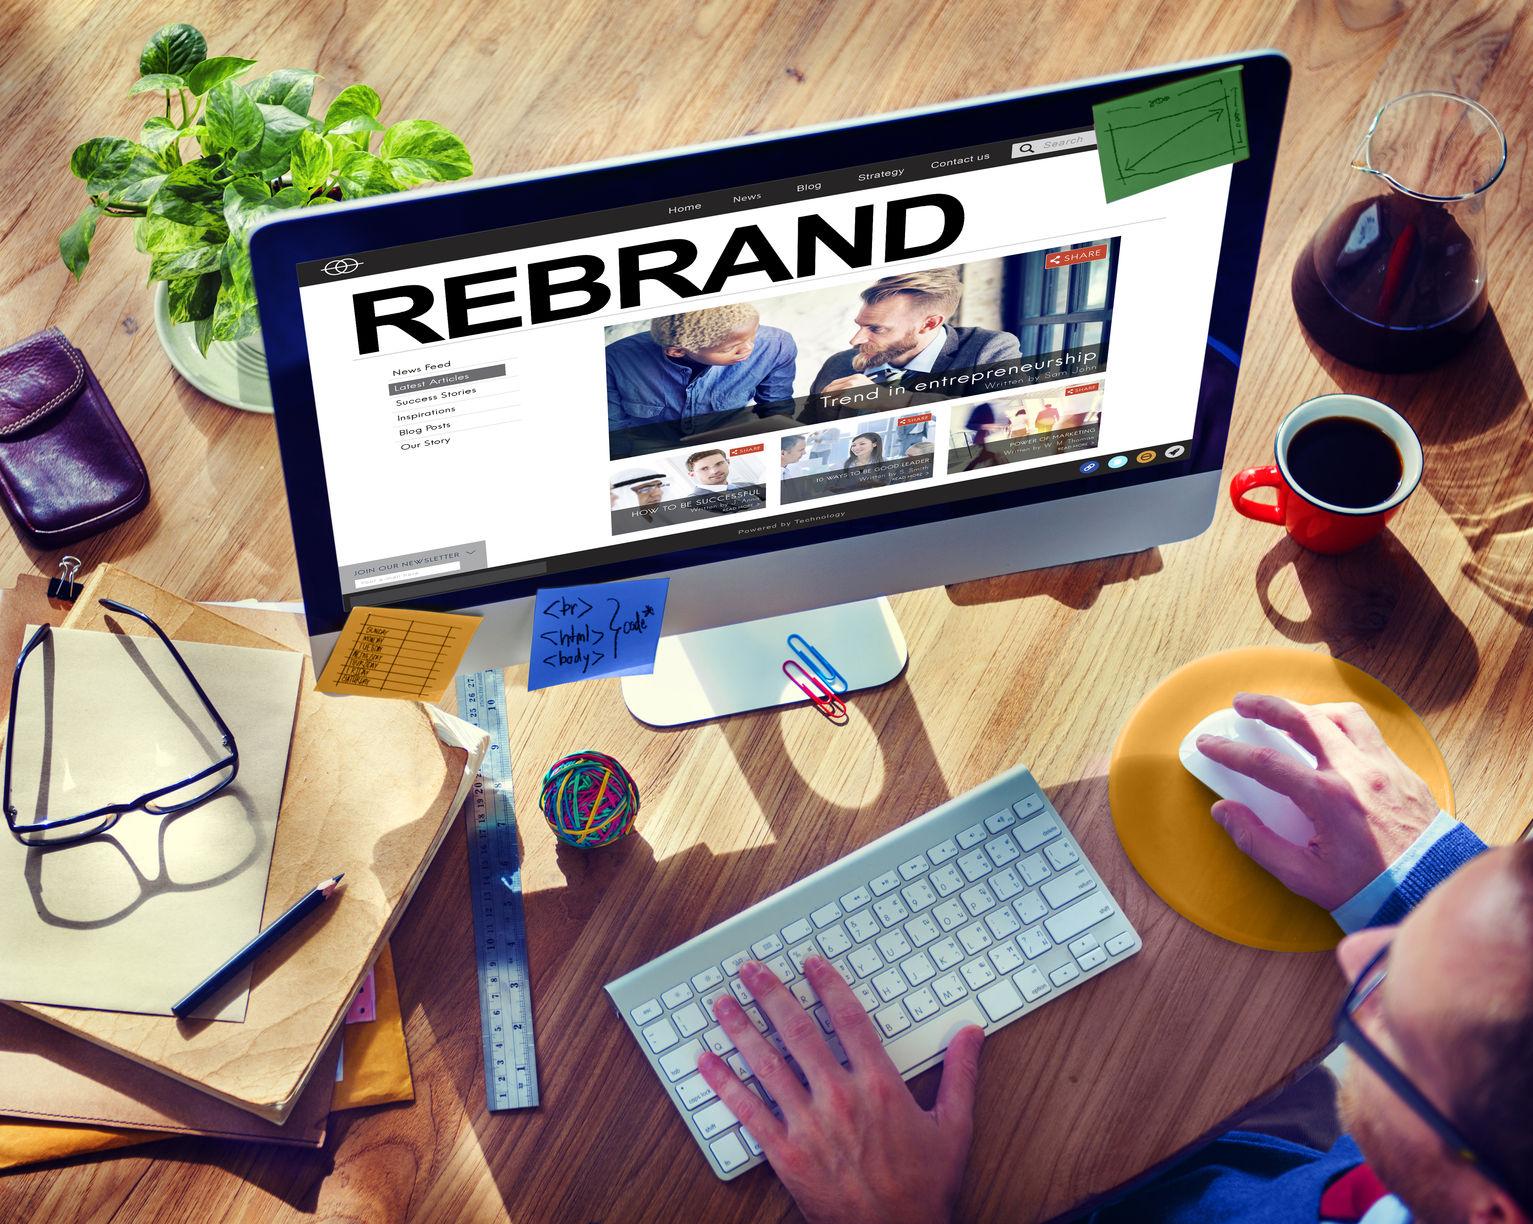 rebrand strategy marketing image corporate brand concept